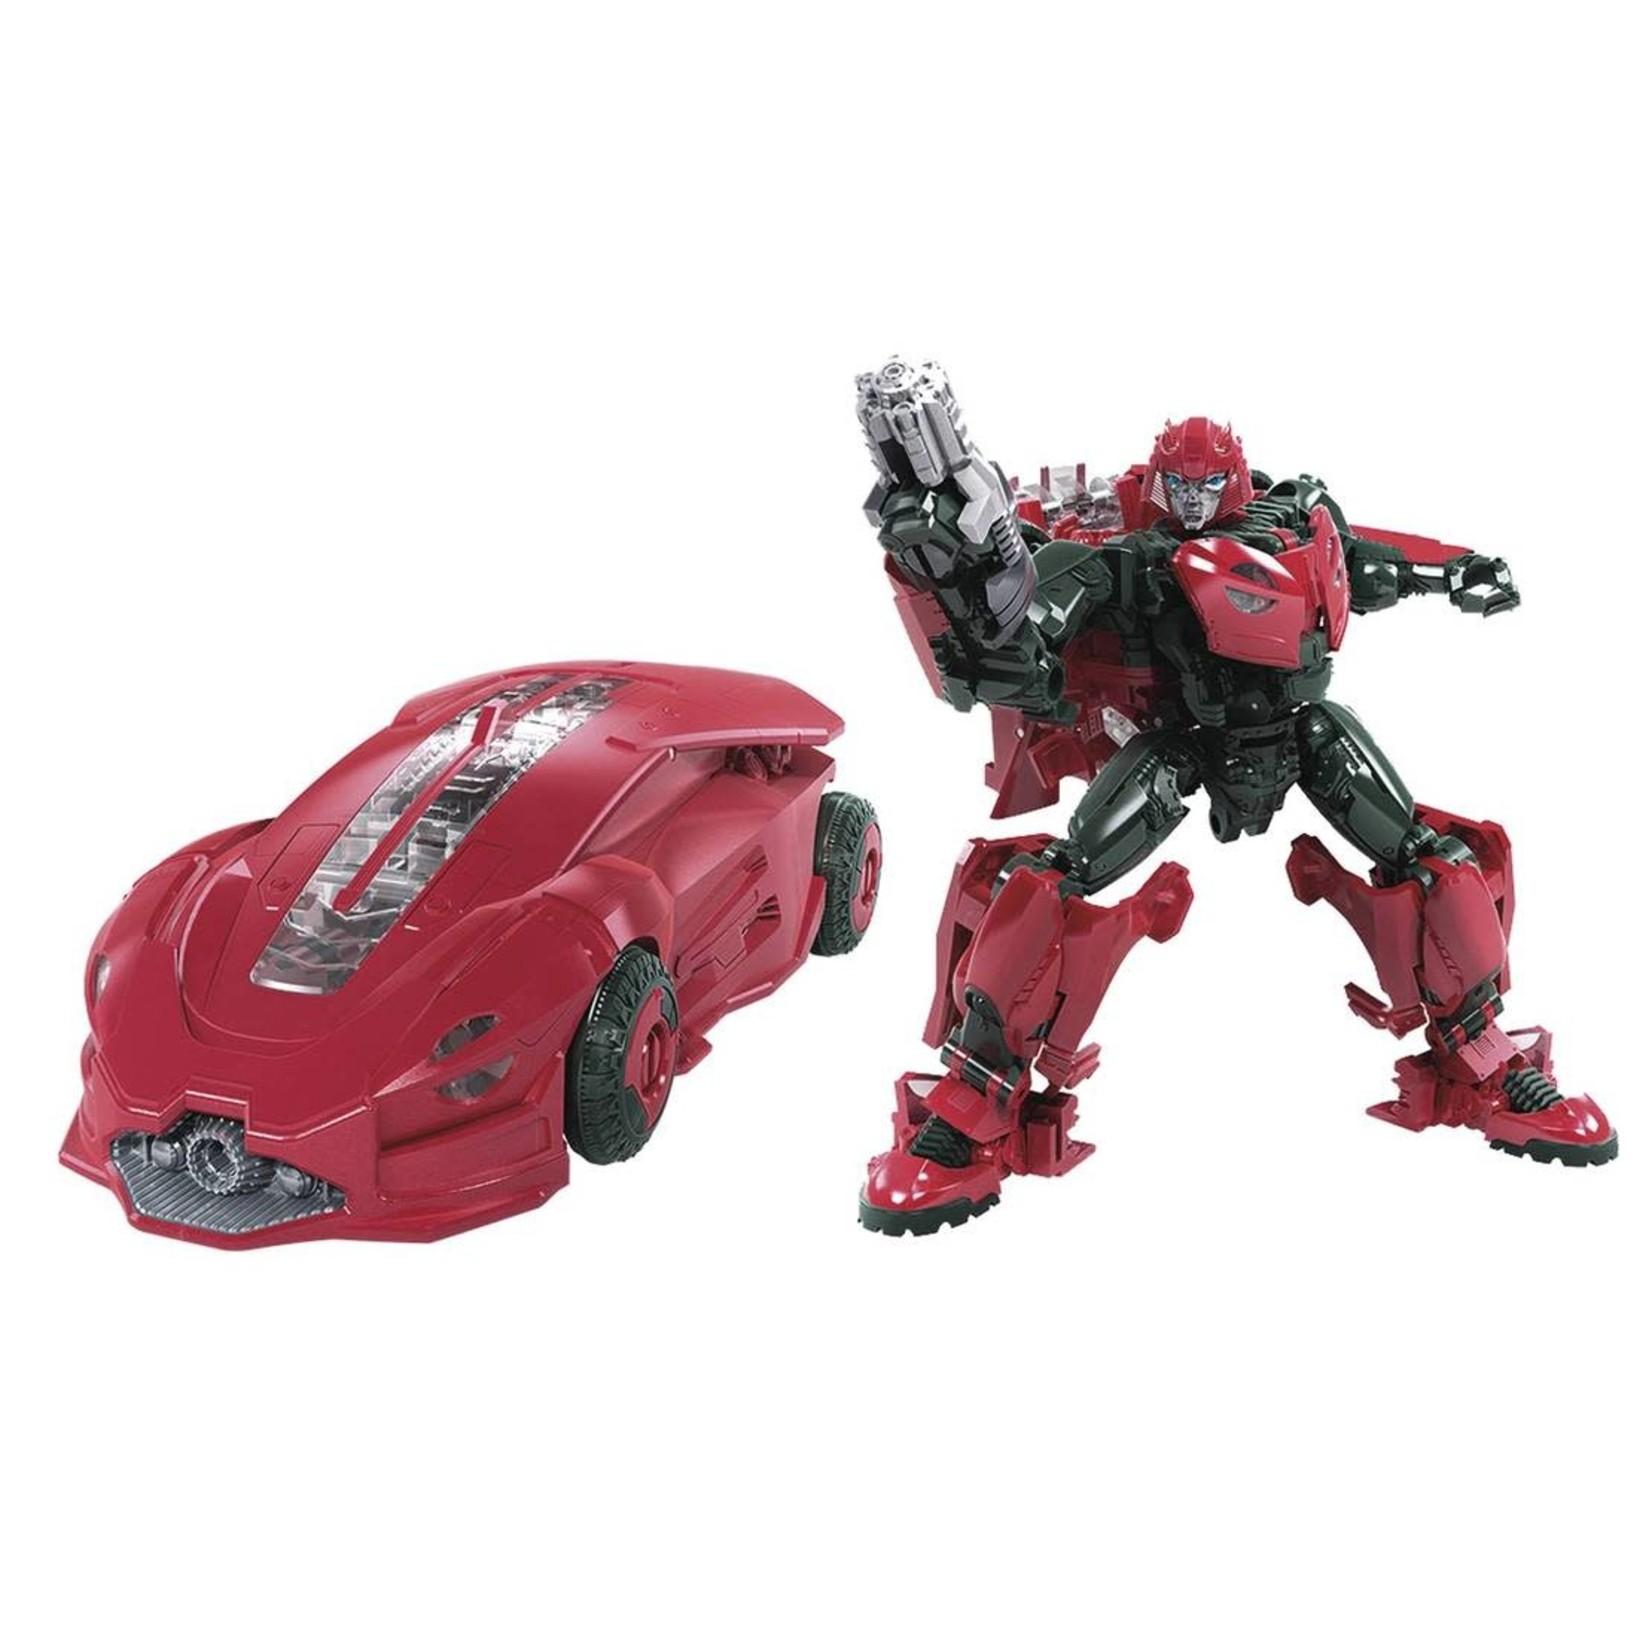 Hasbro Transformers Studio Series Deluxe Class Cliffjumper